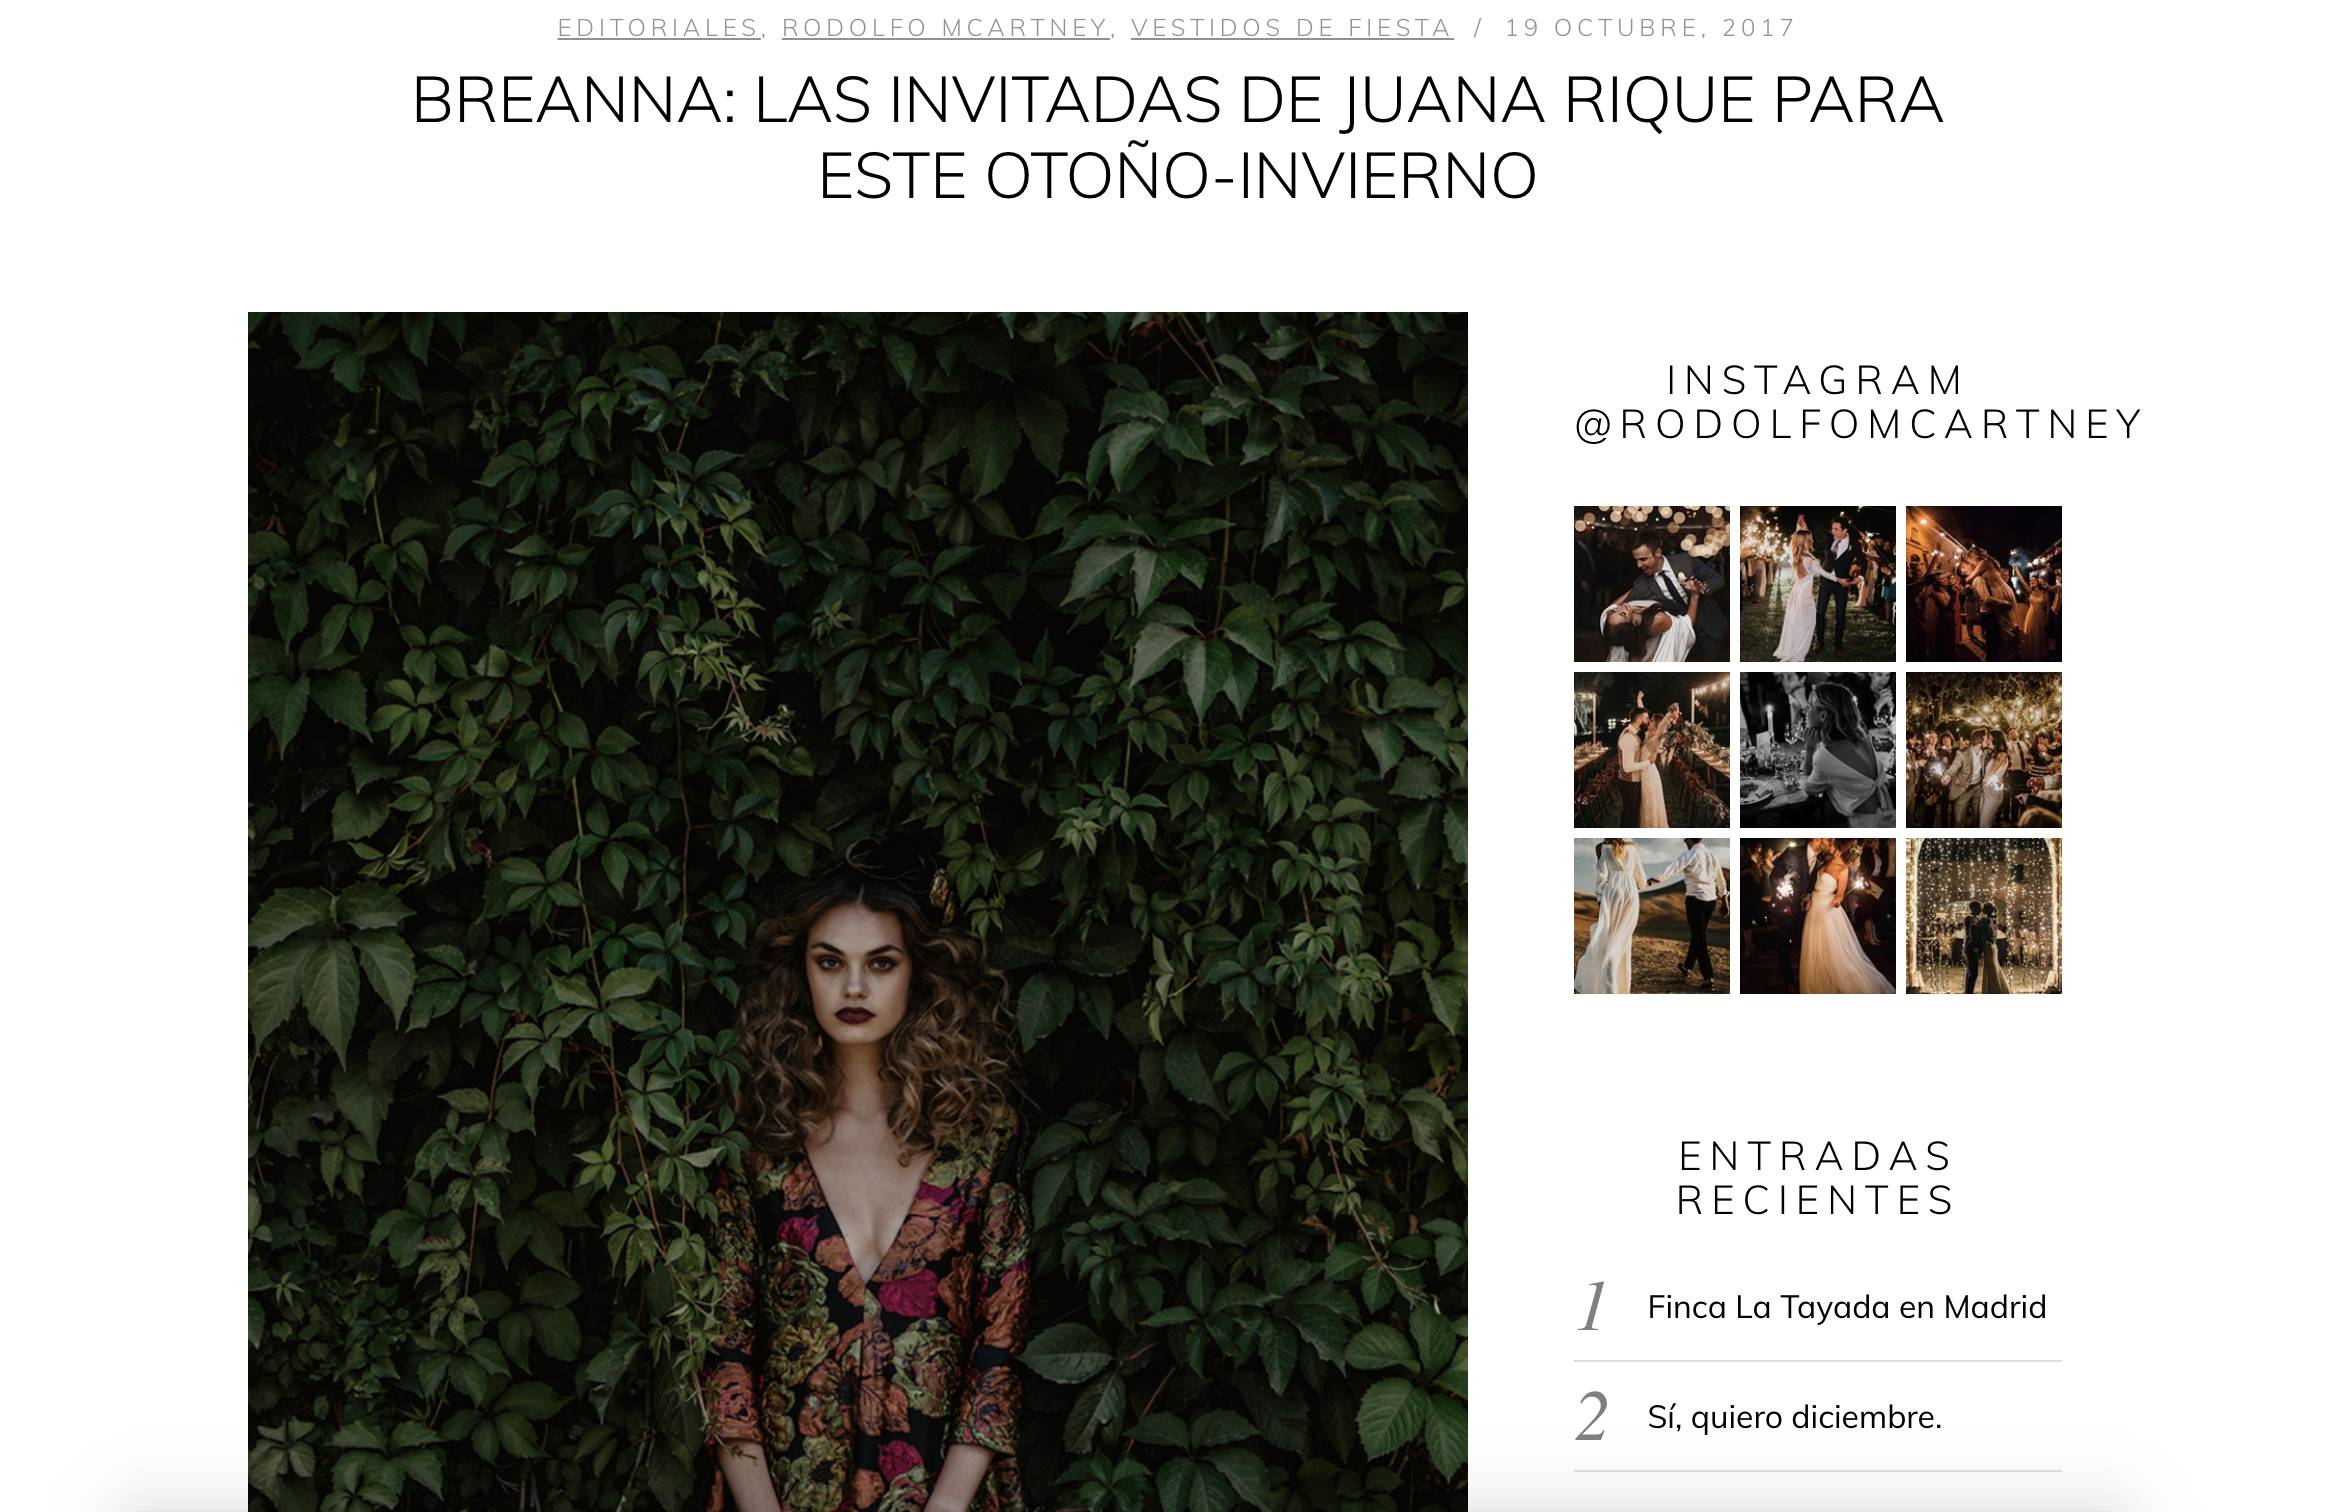 breanna, juana rique, fenix visual, rodolfo mcartney, editorial de boda